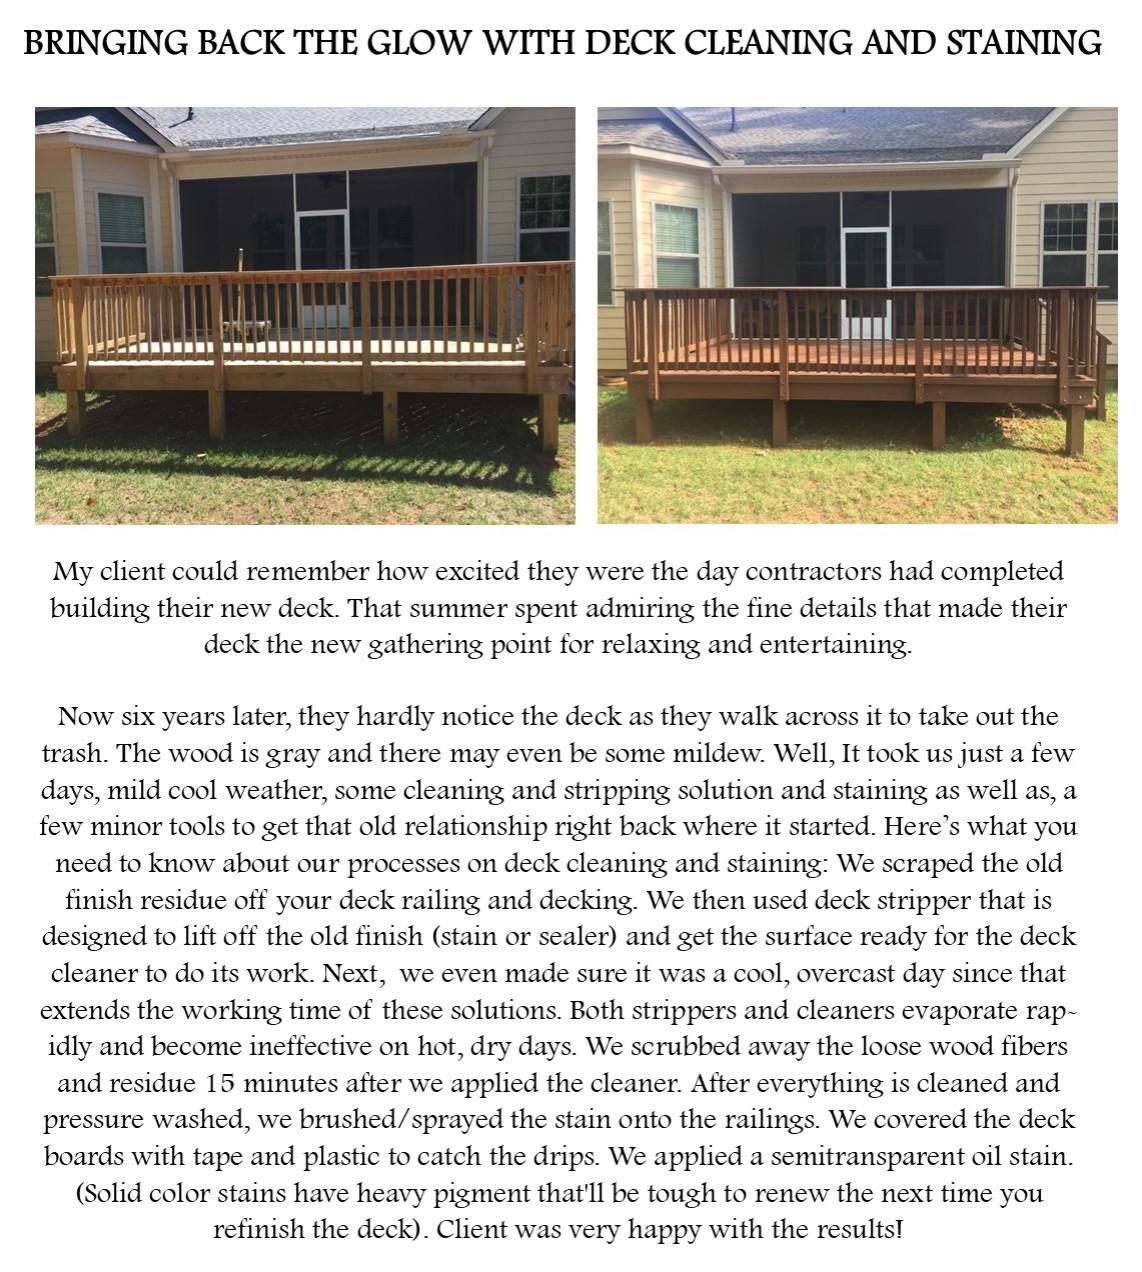 Deck refurbishing and staining